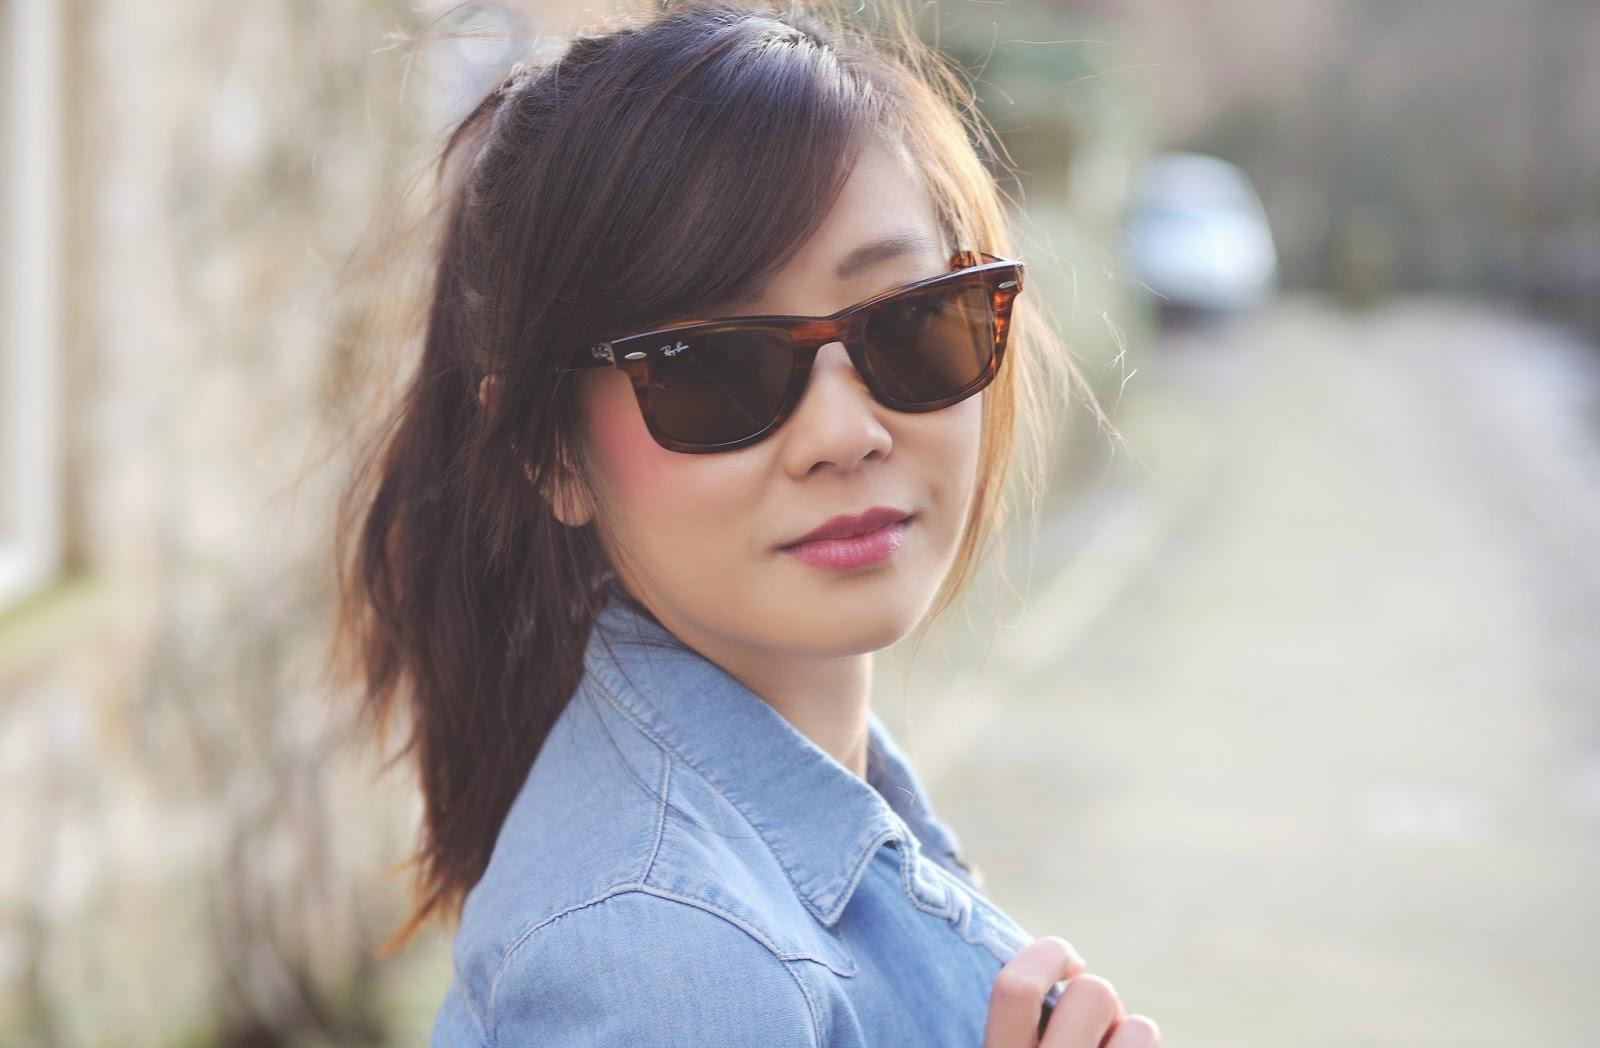 Mac plumful lipstick for asian skintone, what mac plumful look like on lips